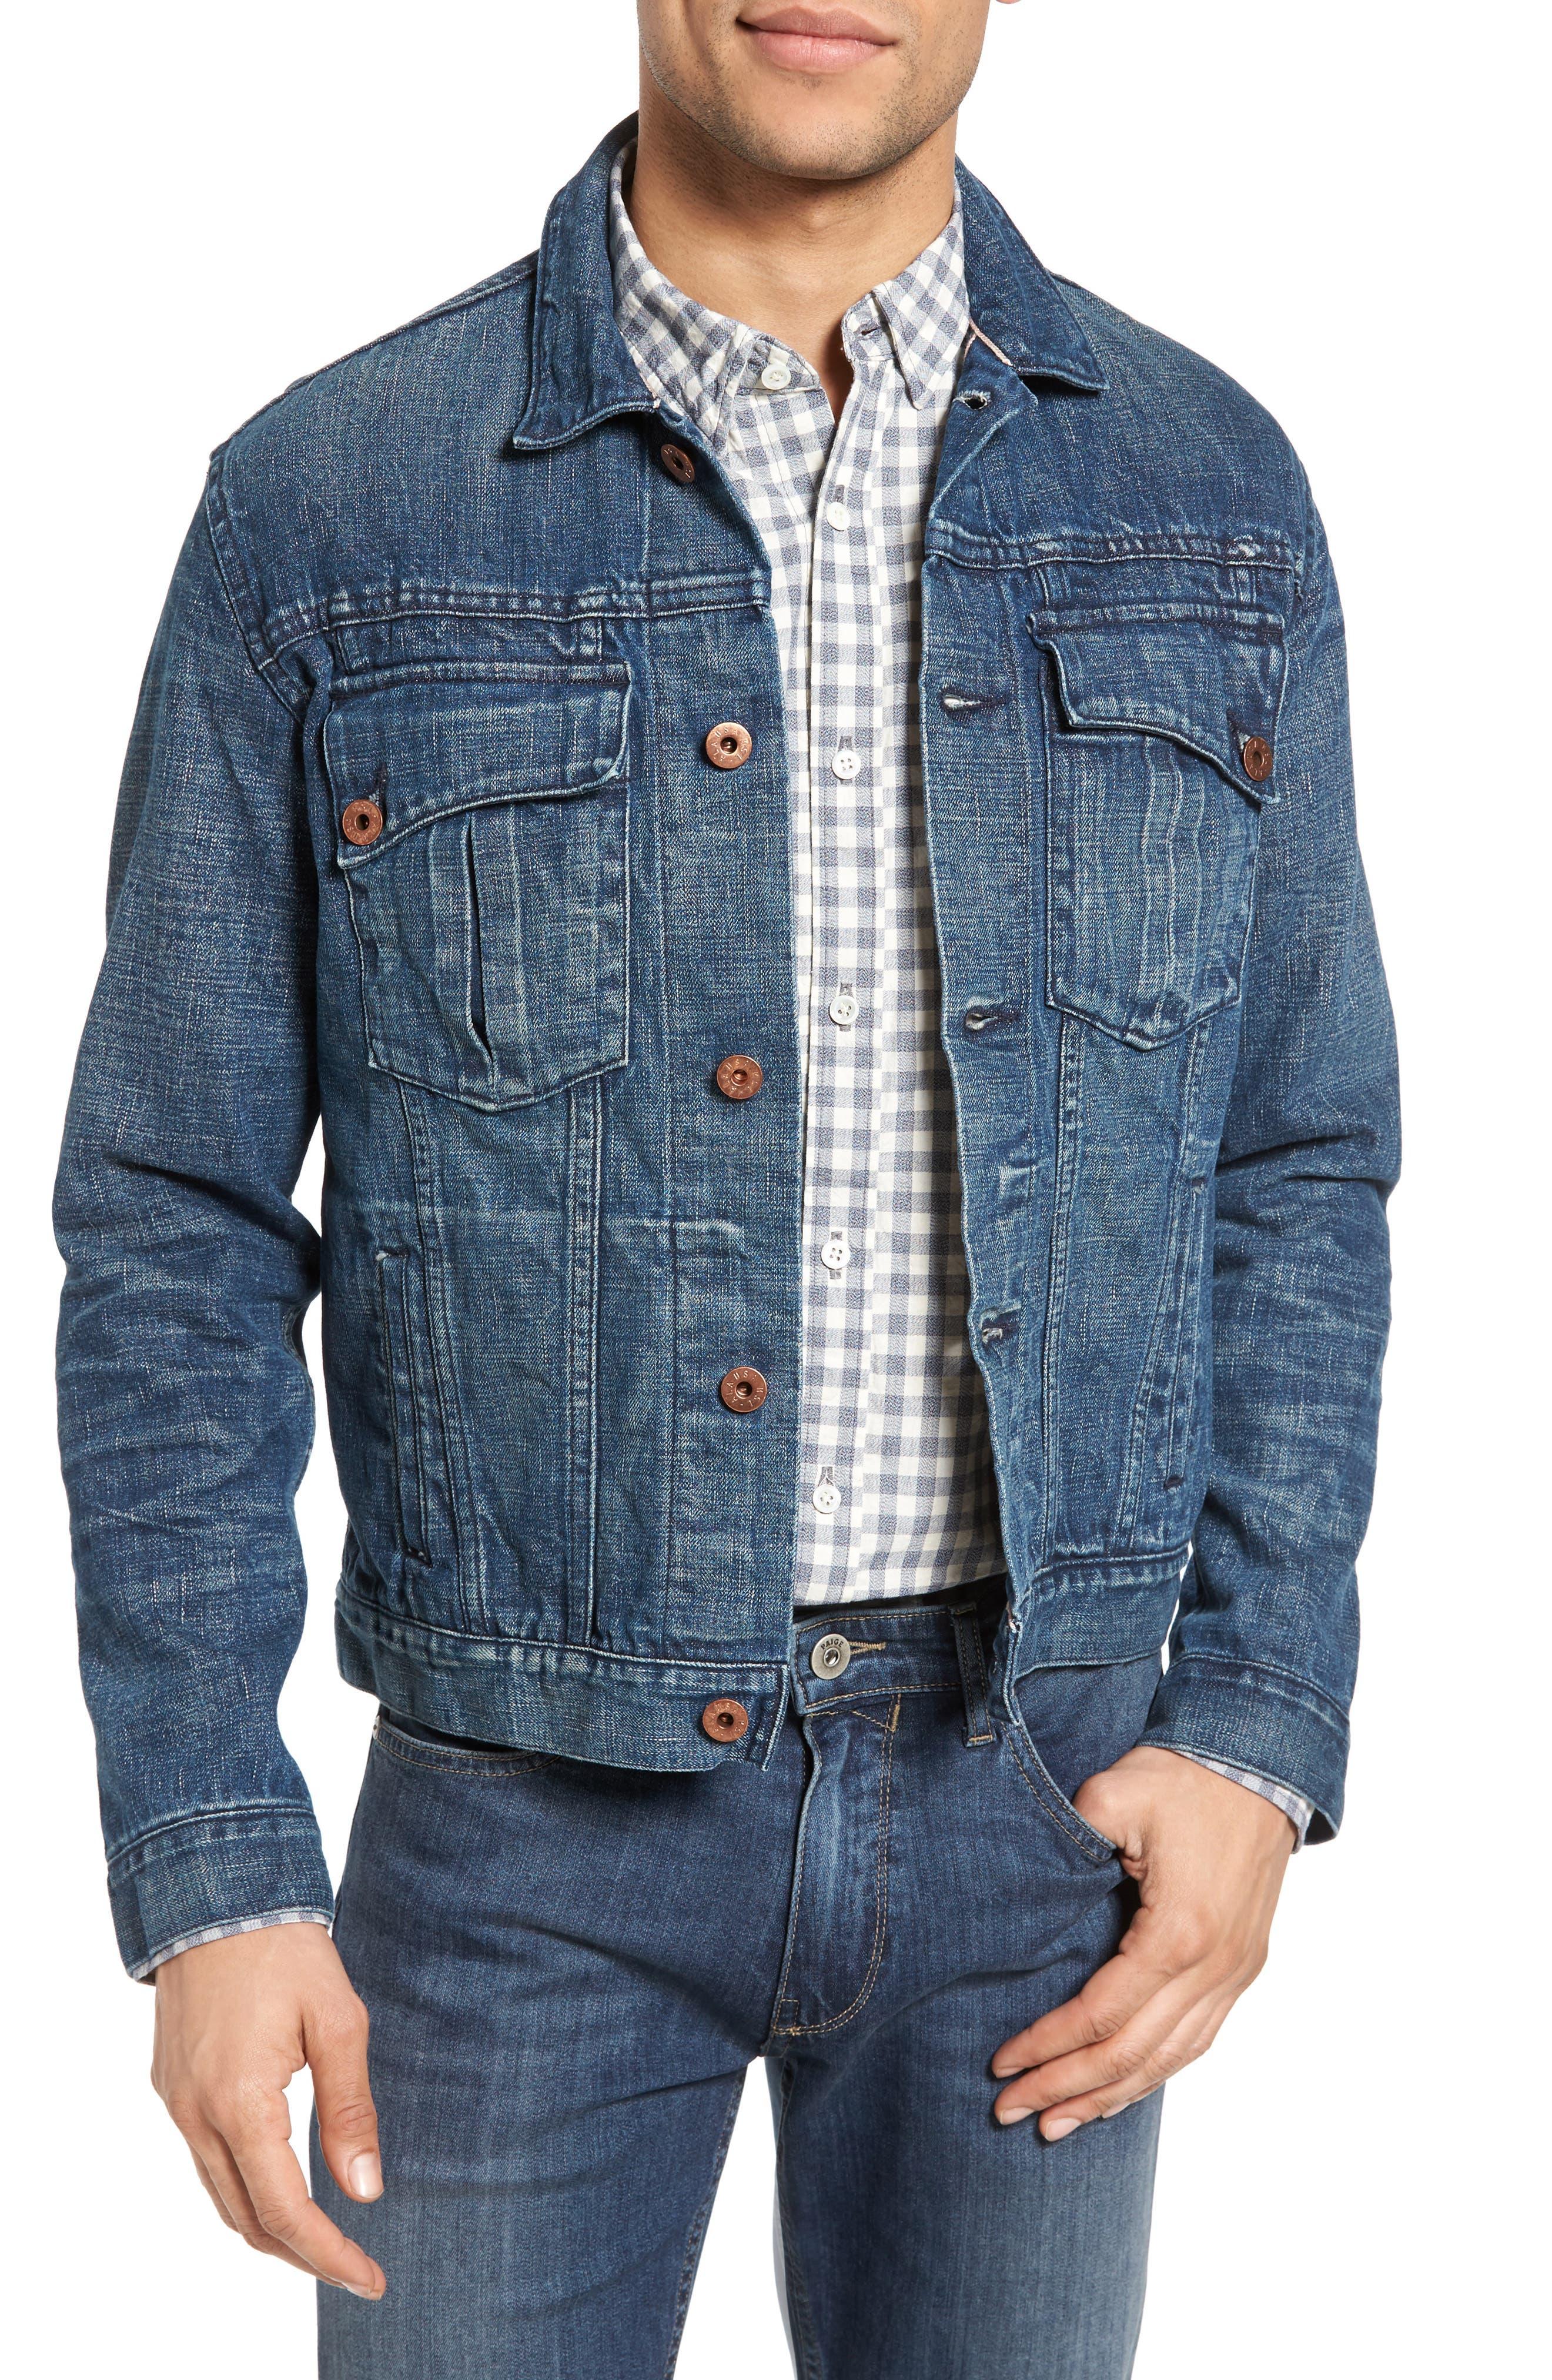 Clayton Distressed Selvedge Denim Jacket,                         Main,                         color, Denim Wash